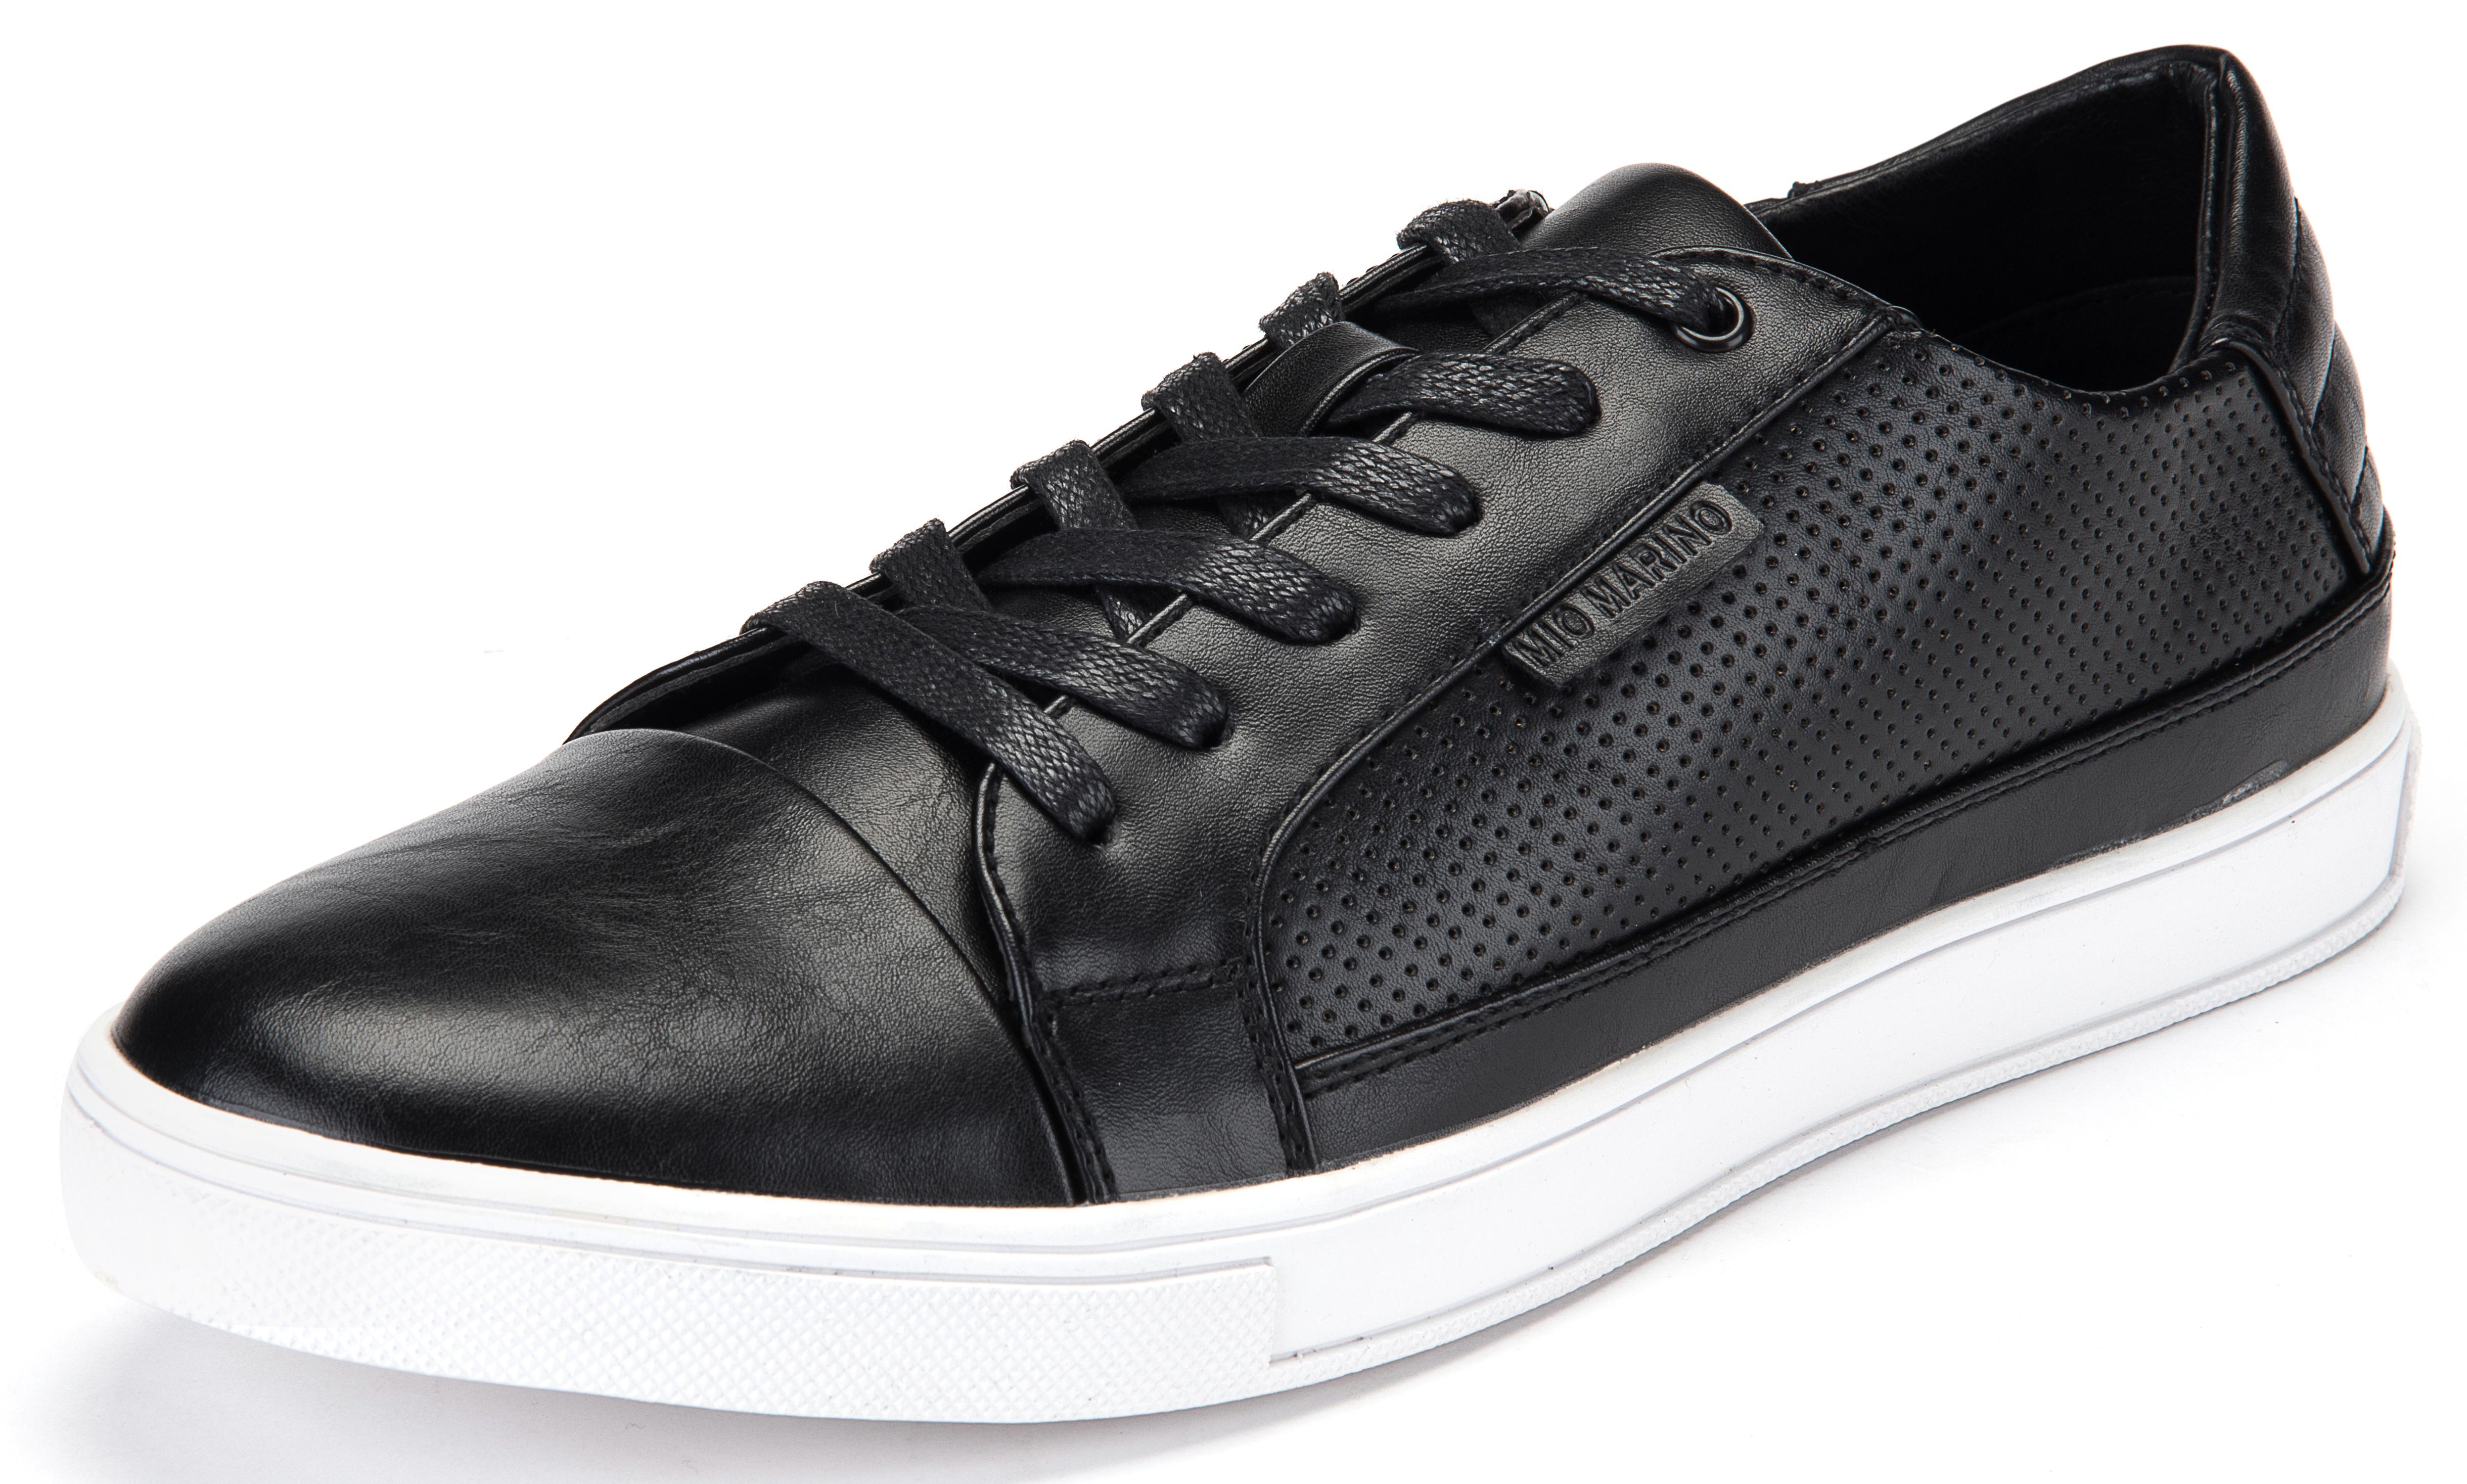 Dappled Lace Fashion Sneakers Black | Trada Marketplace